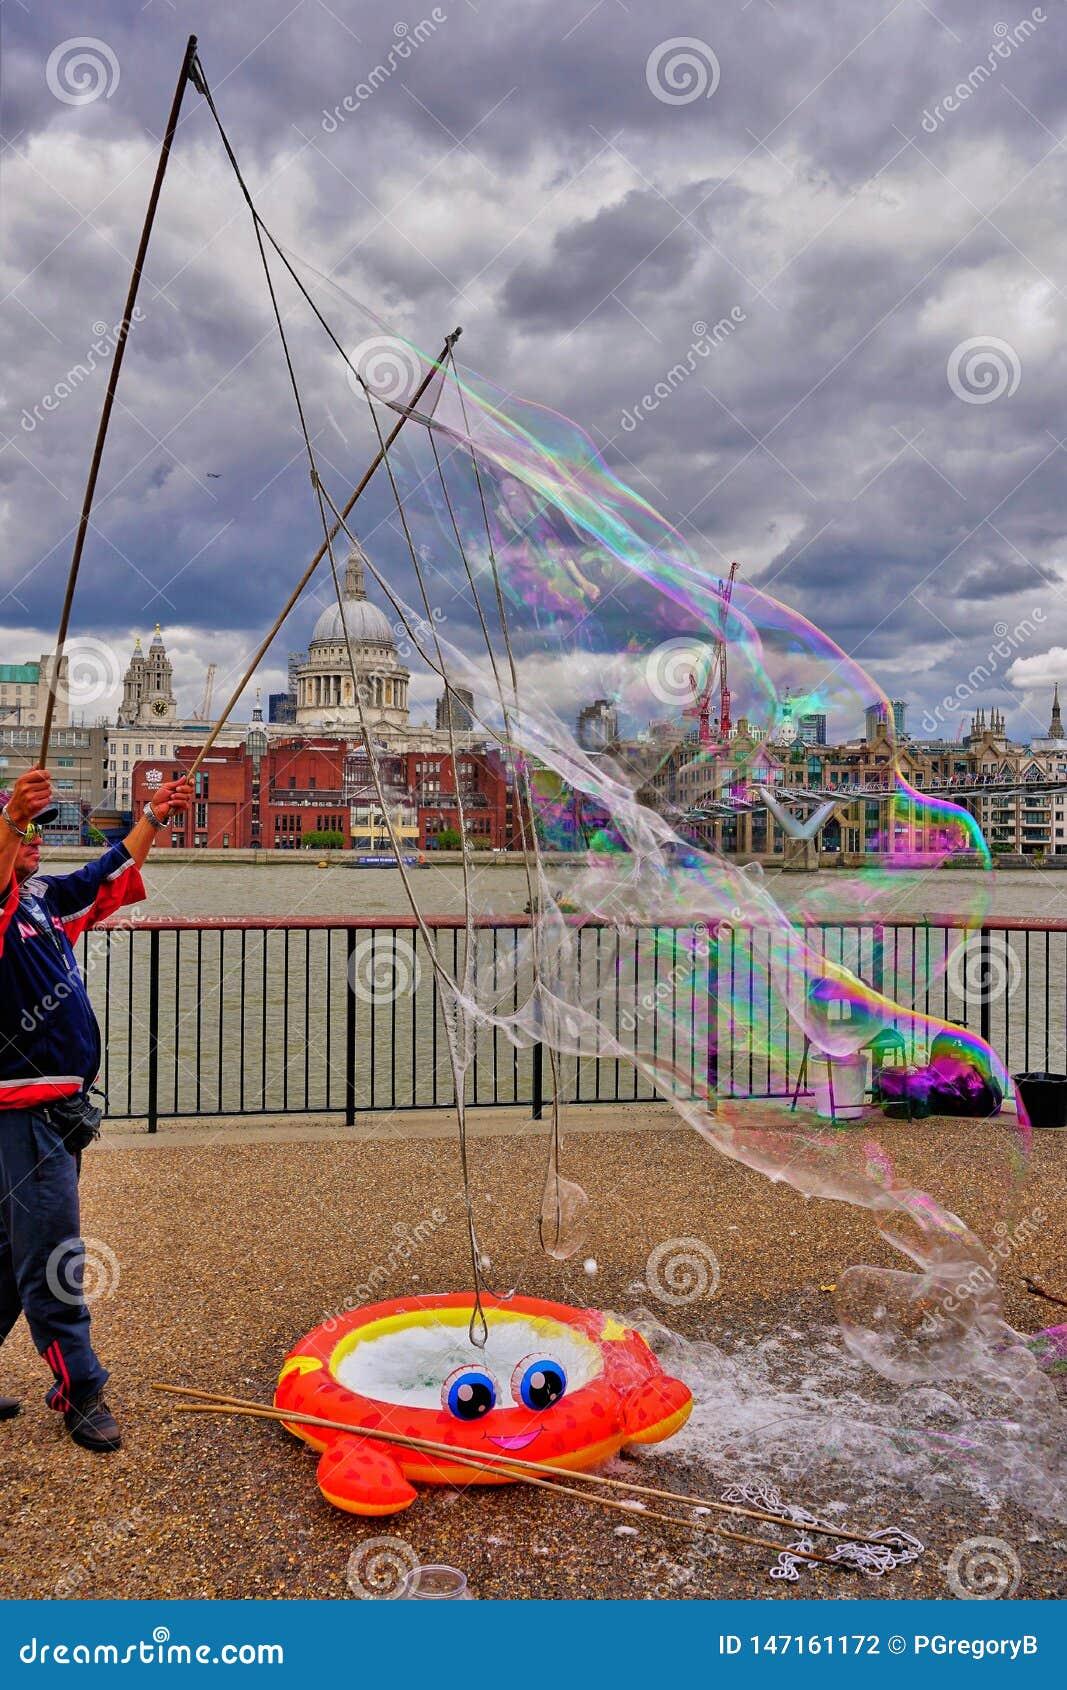 London street entertainer creates mega bubbles.